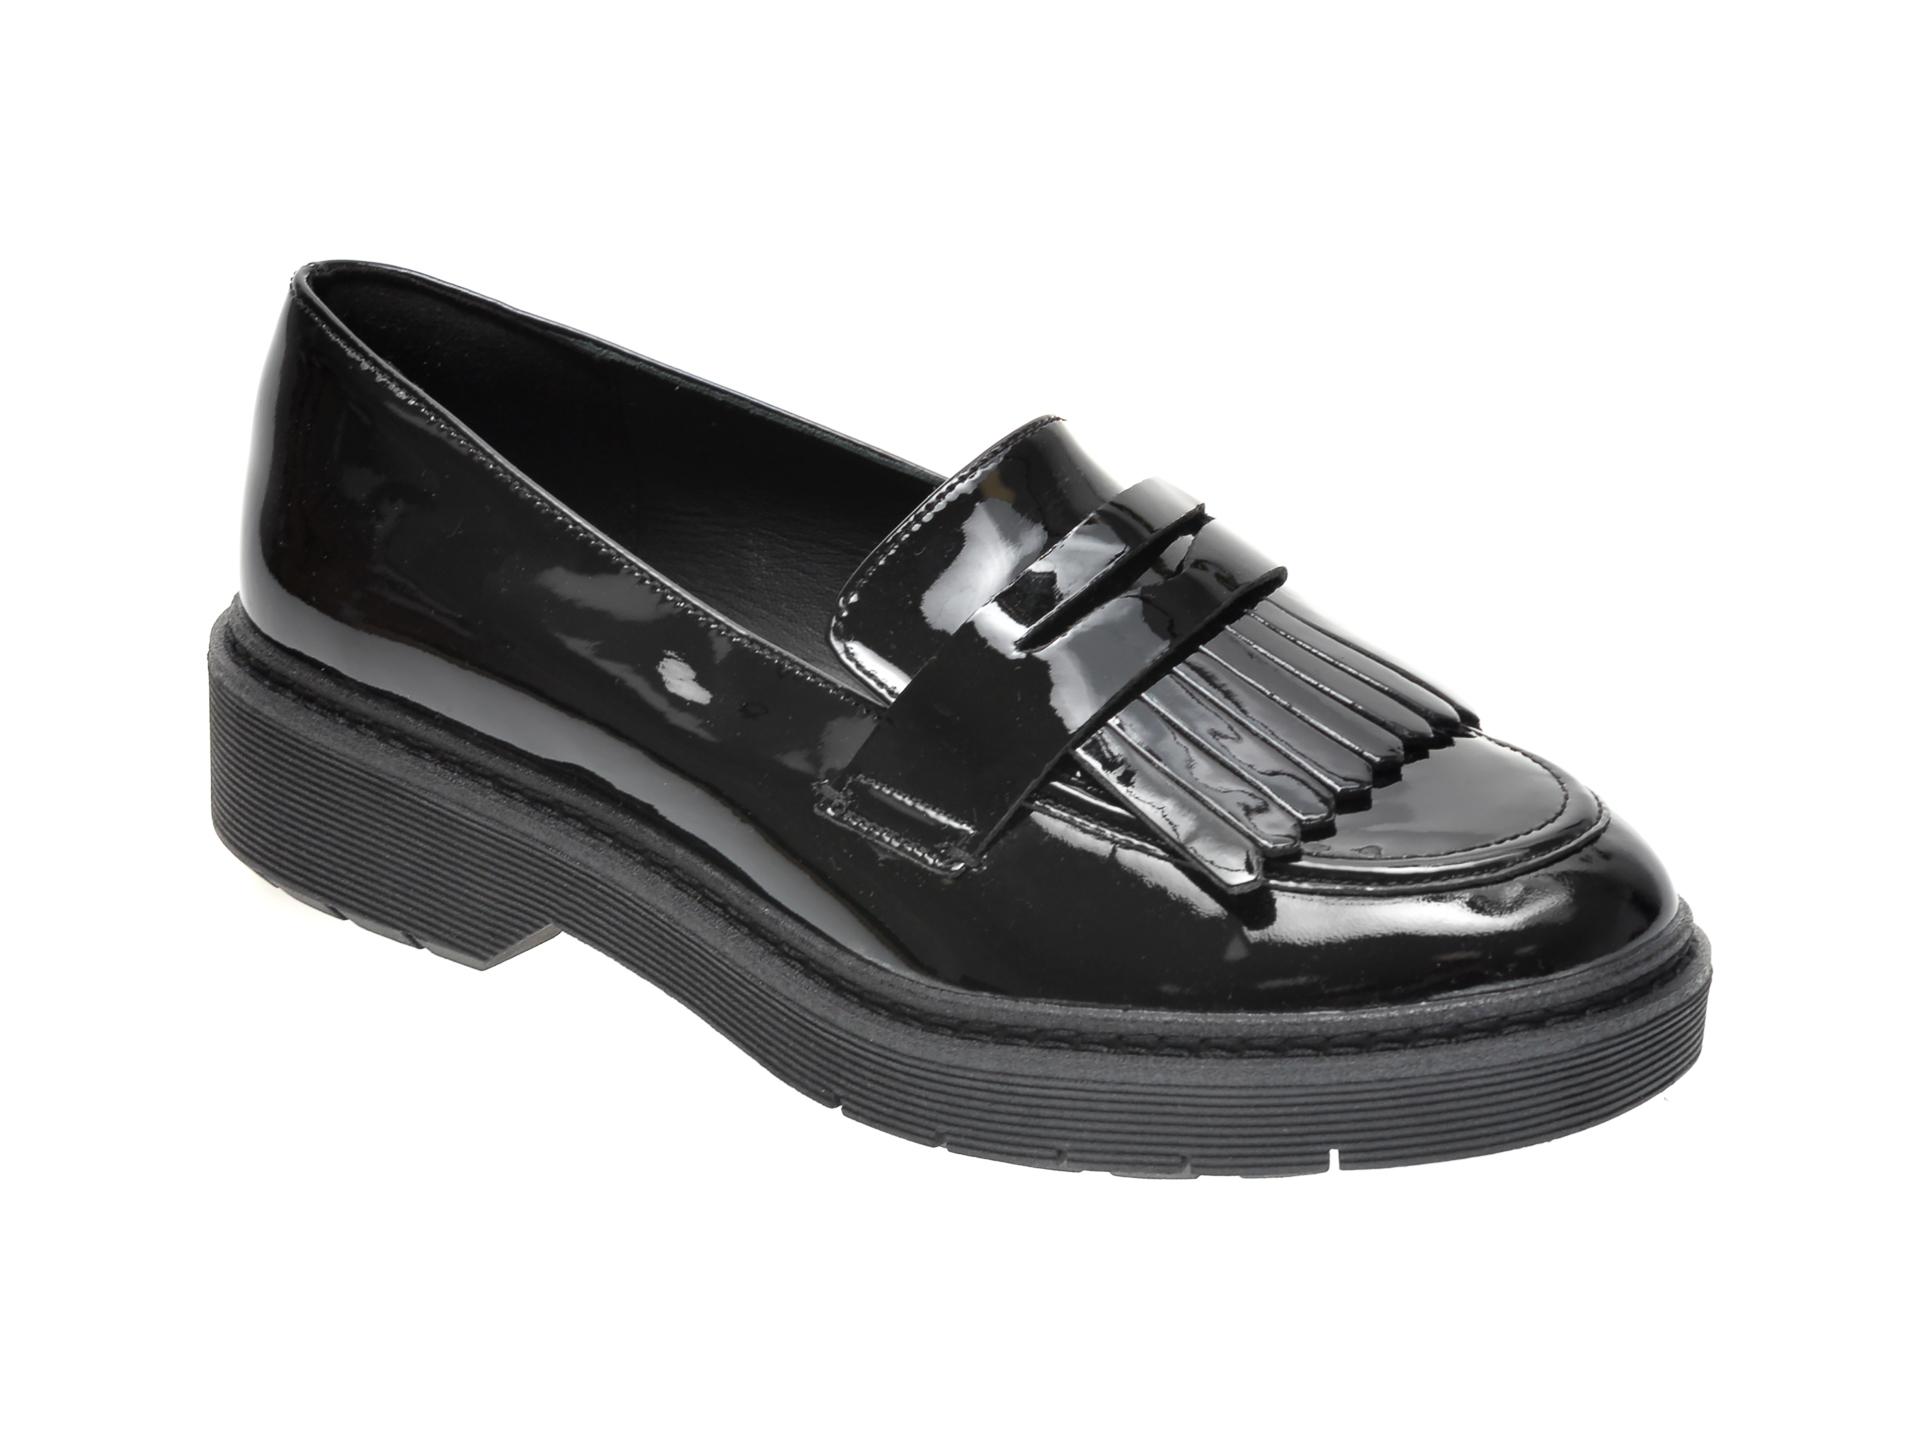 /femei/pantofi Dama/pantofi Casual Dama